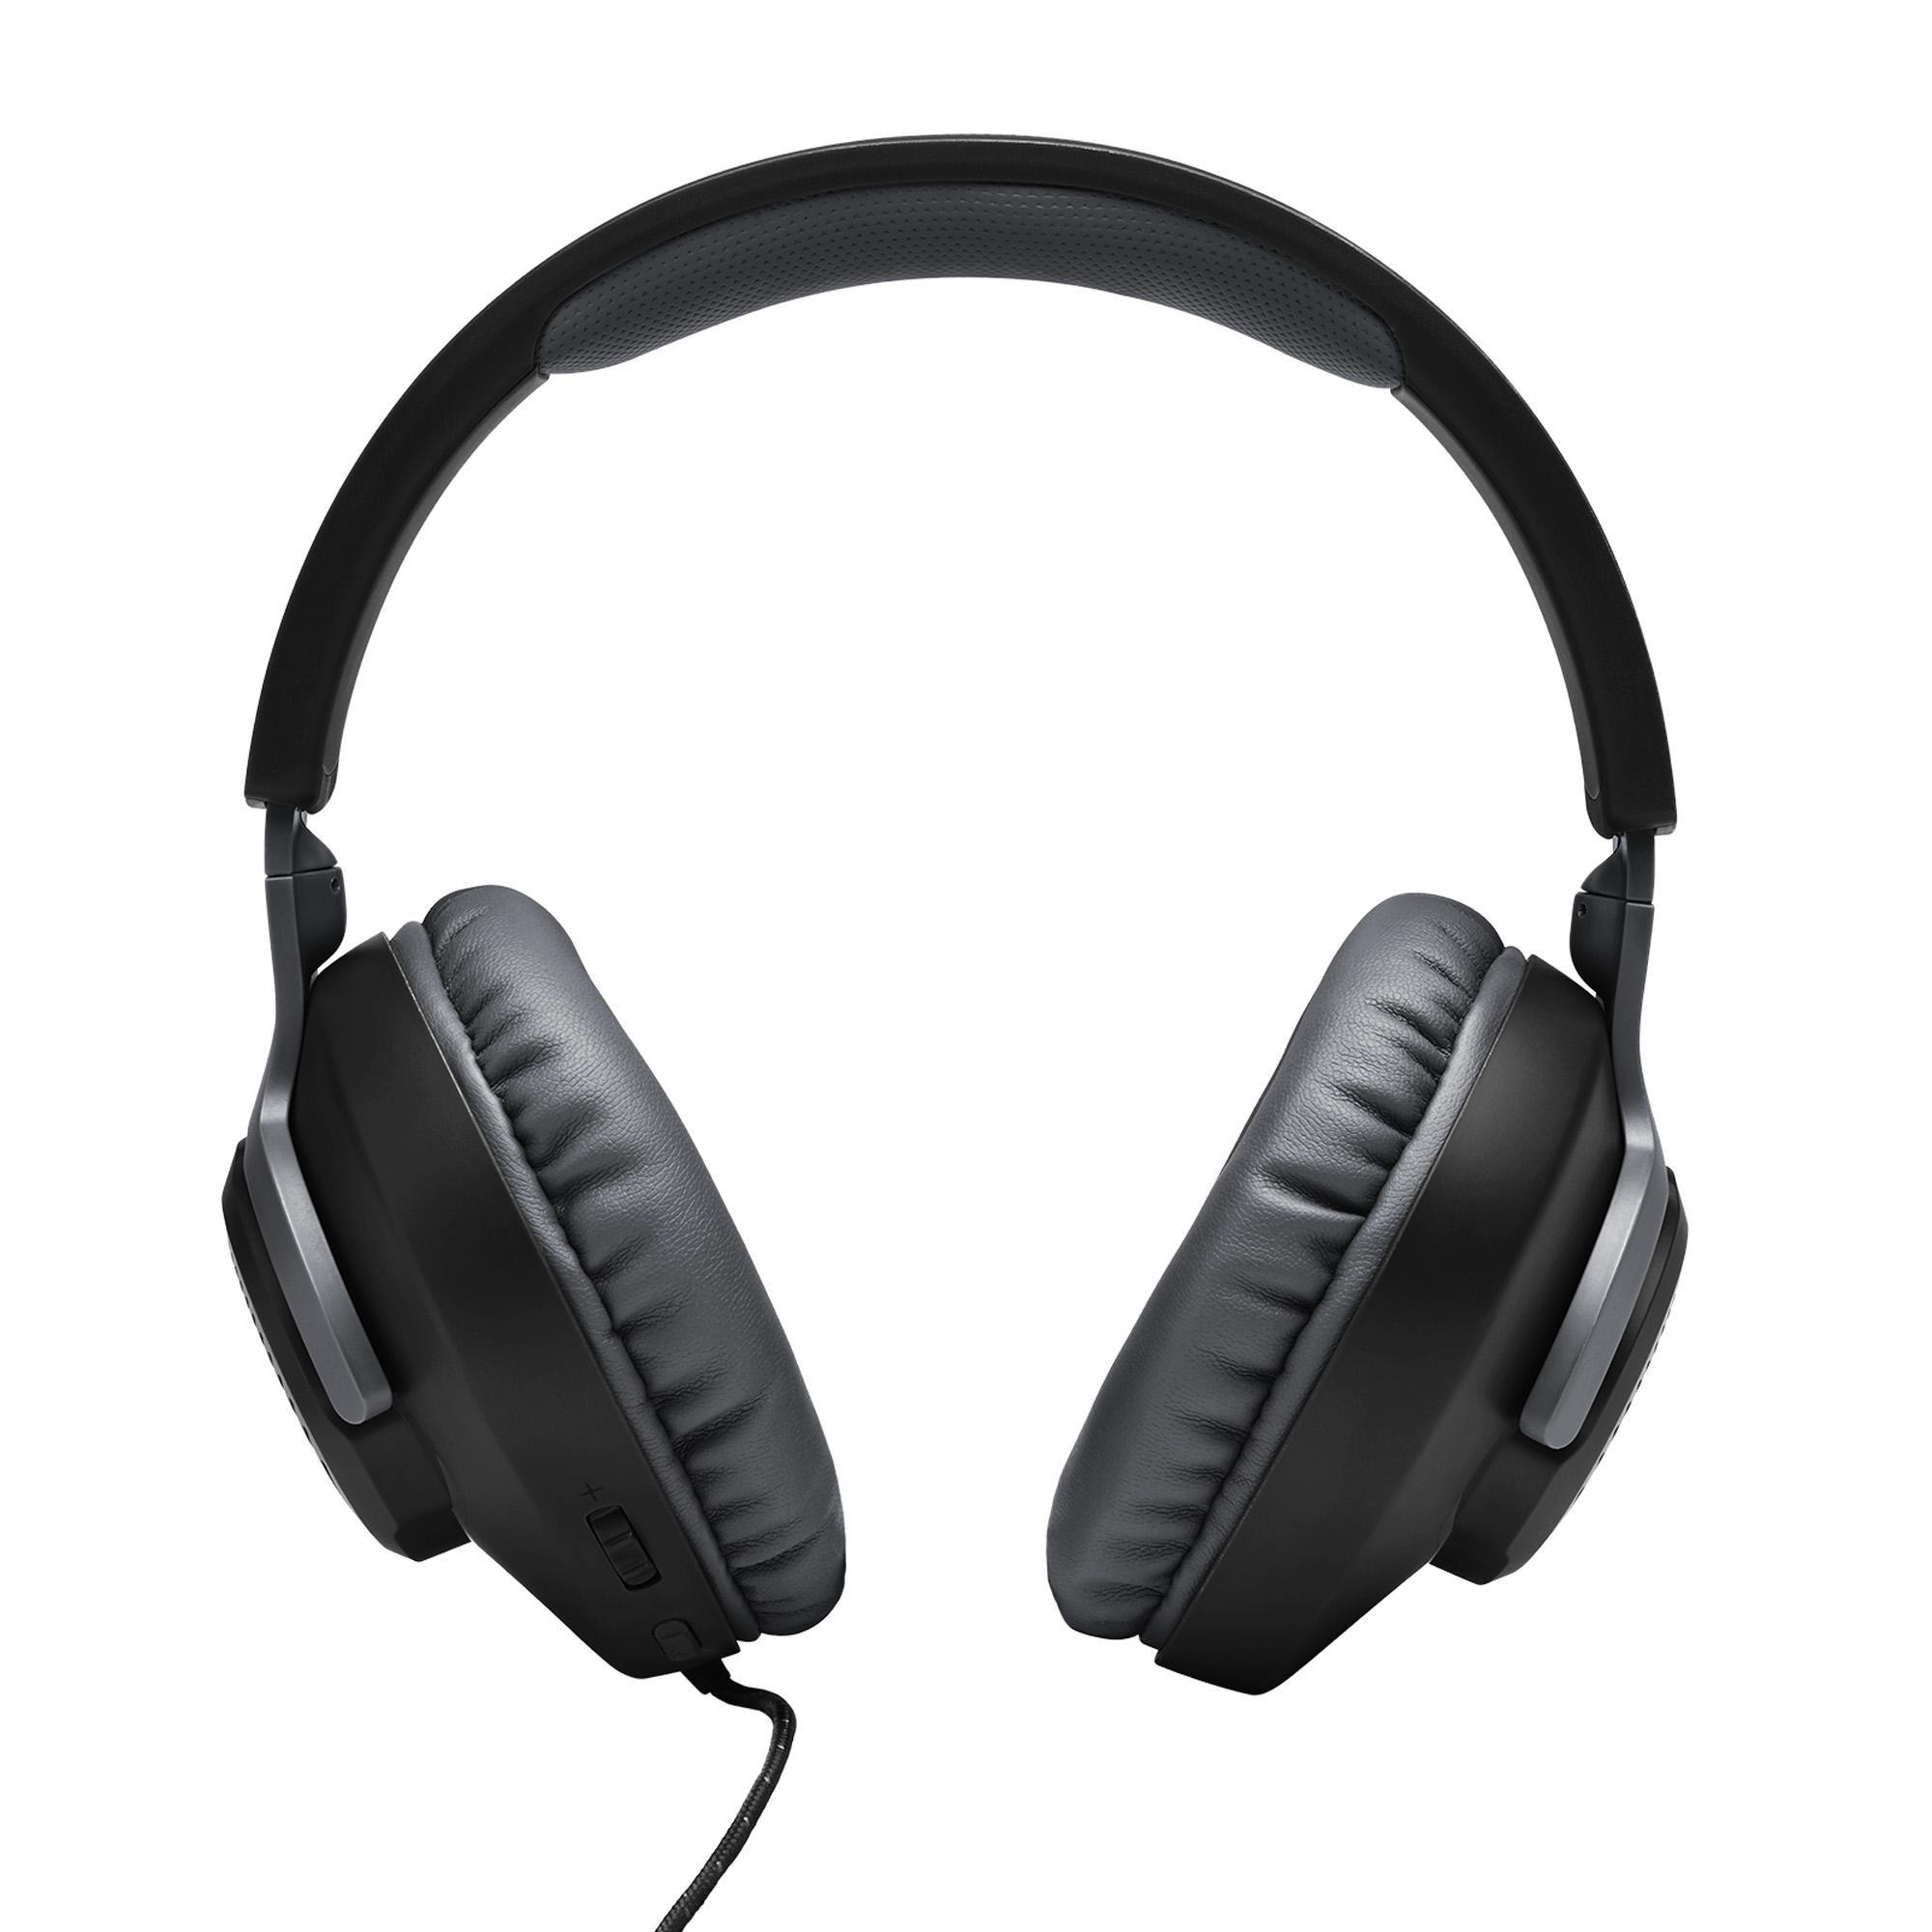 Headset Gamer JBL Quantum 100 (PC Ps4 Xbox One Switch)